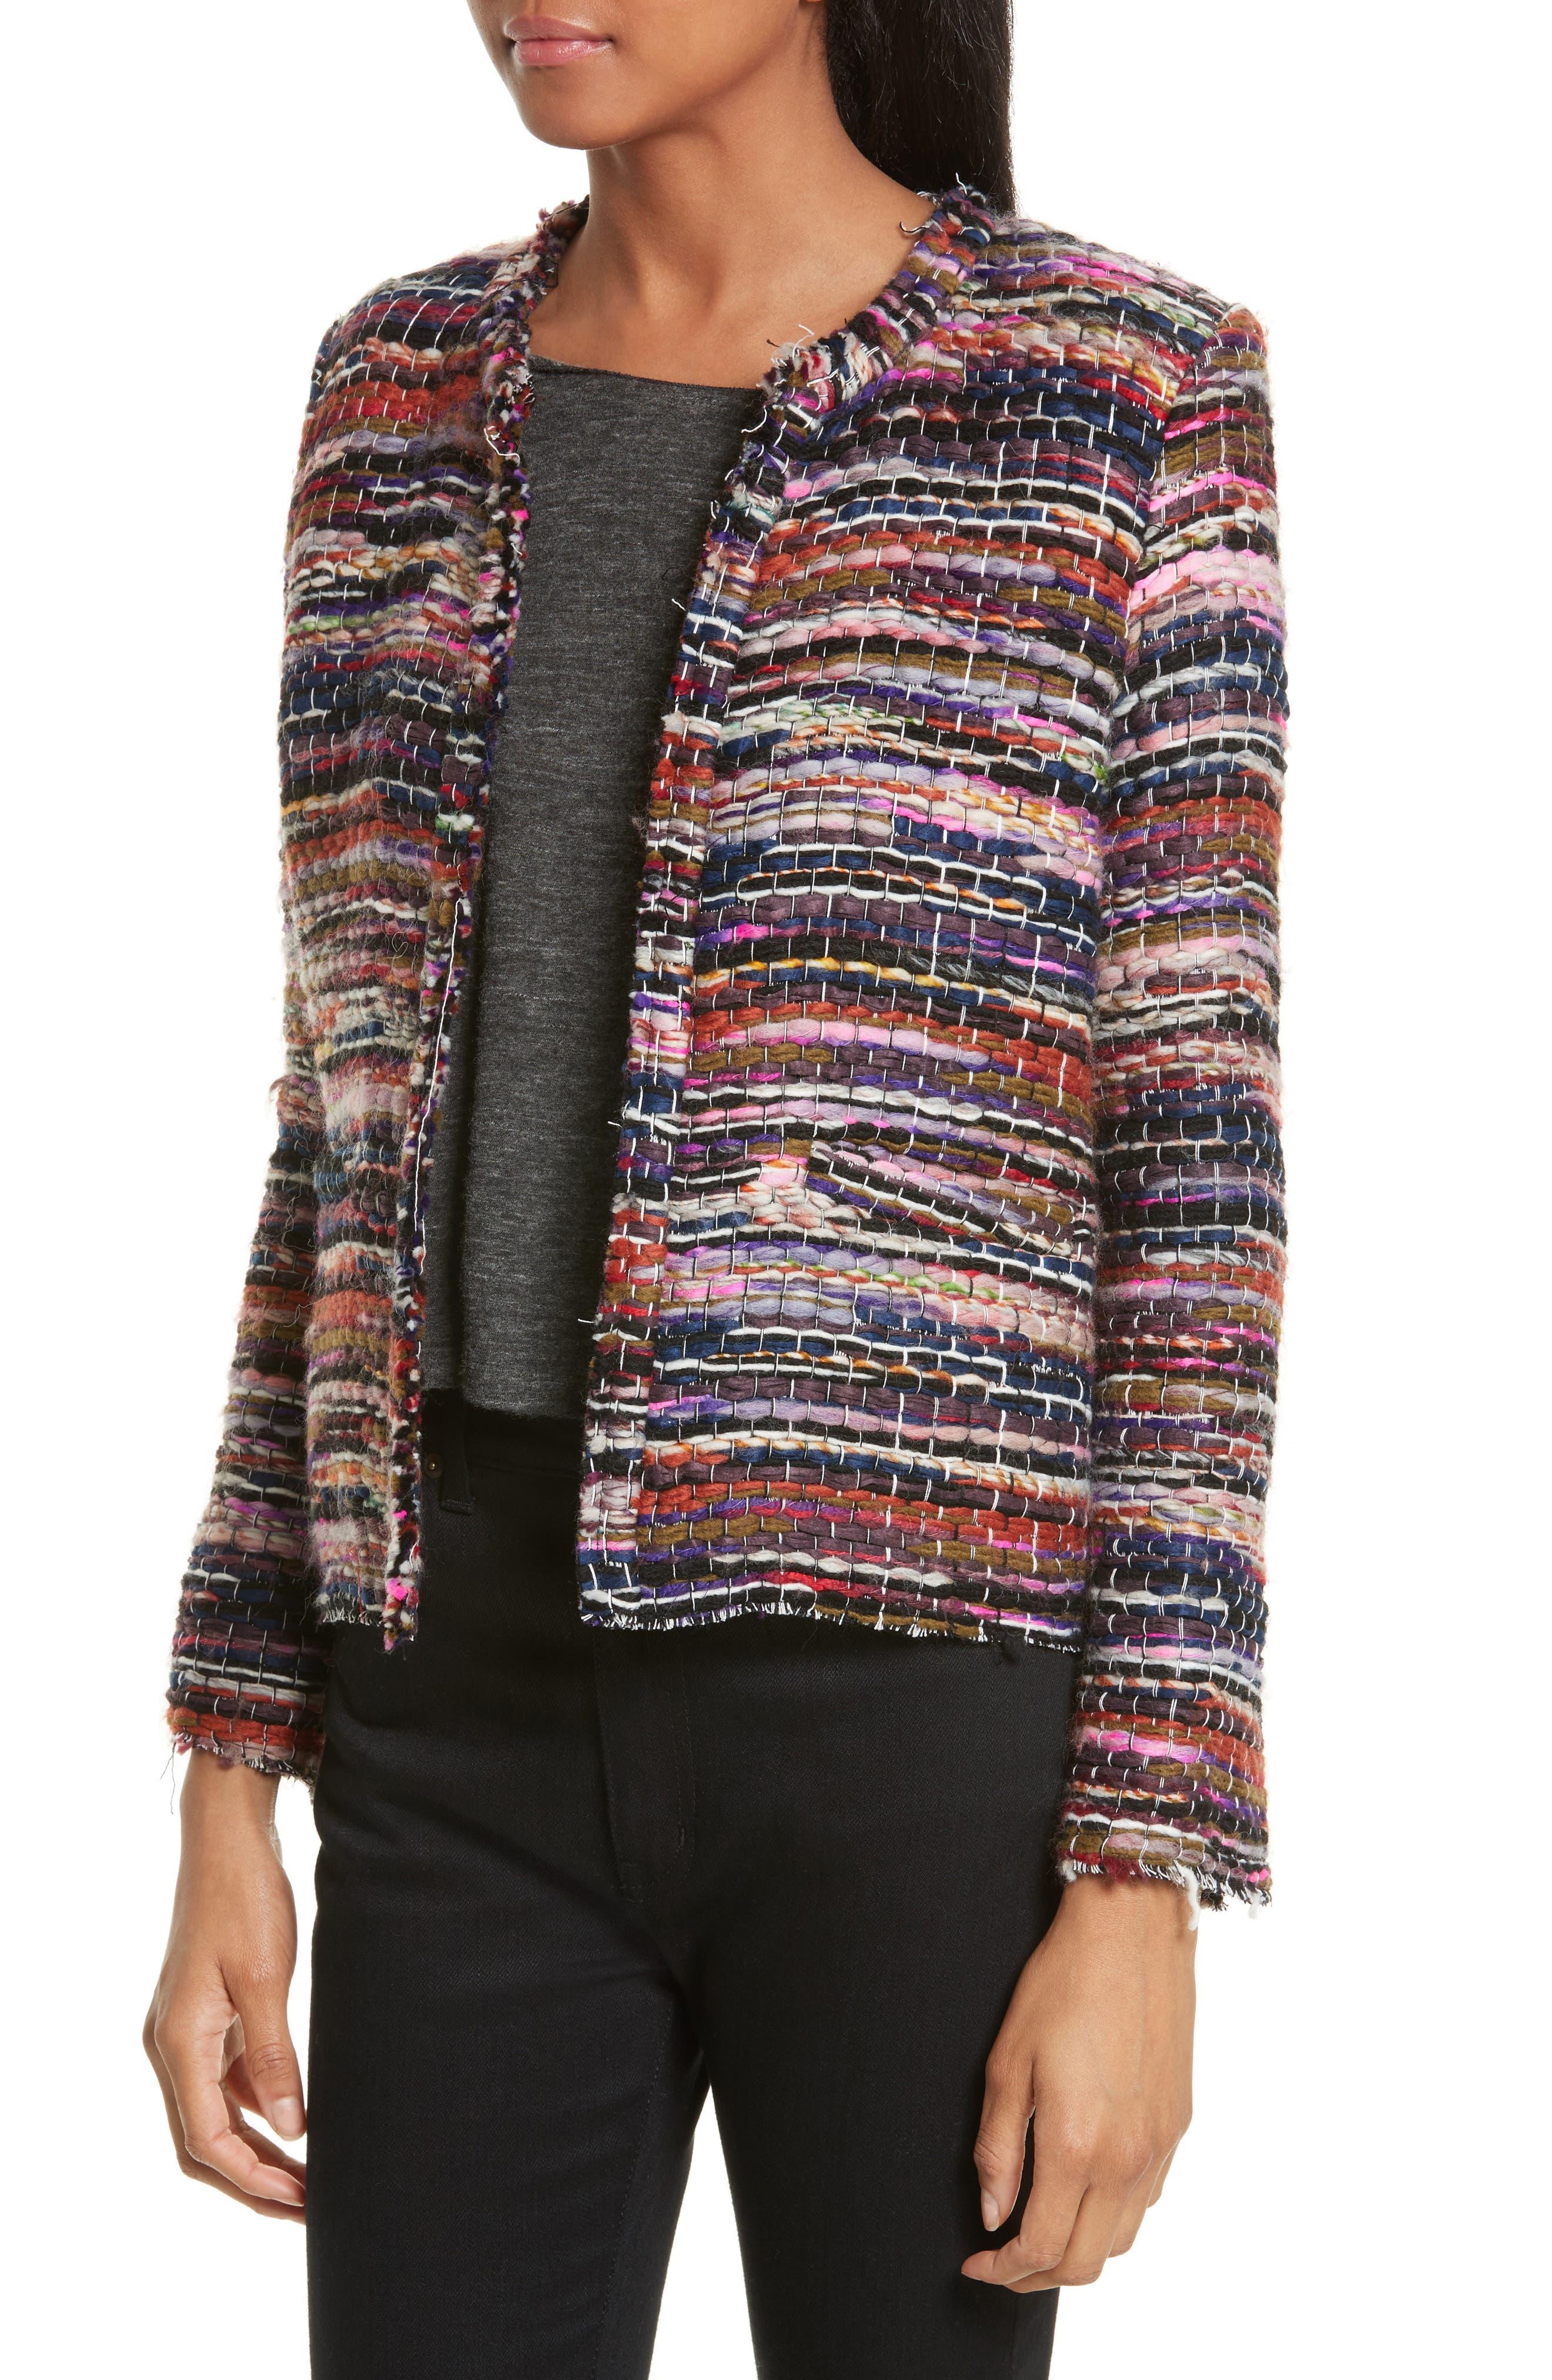 Namanta Tweed Jacket,                             Alternate thumbnail 3, color,                             Mulberry